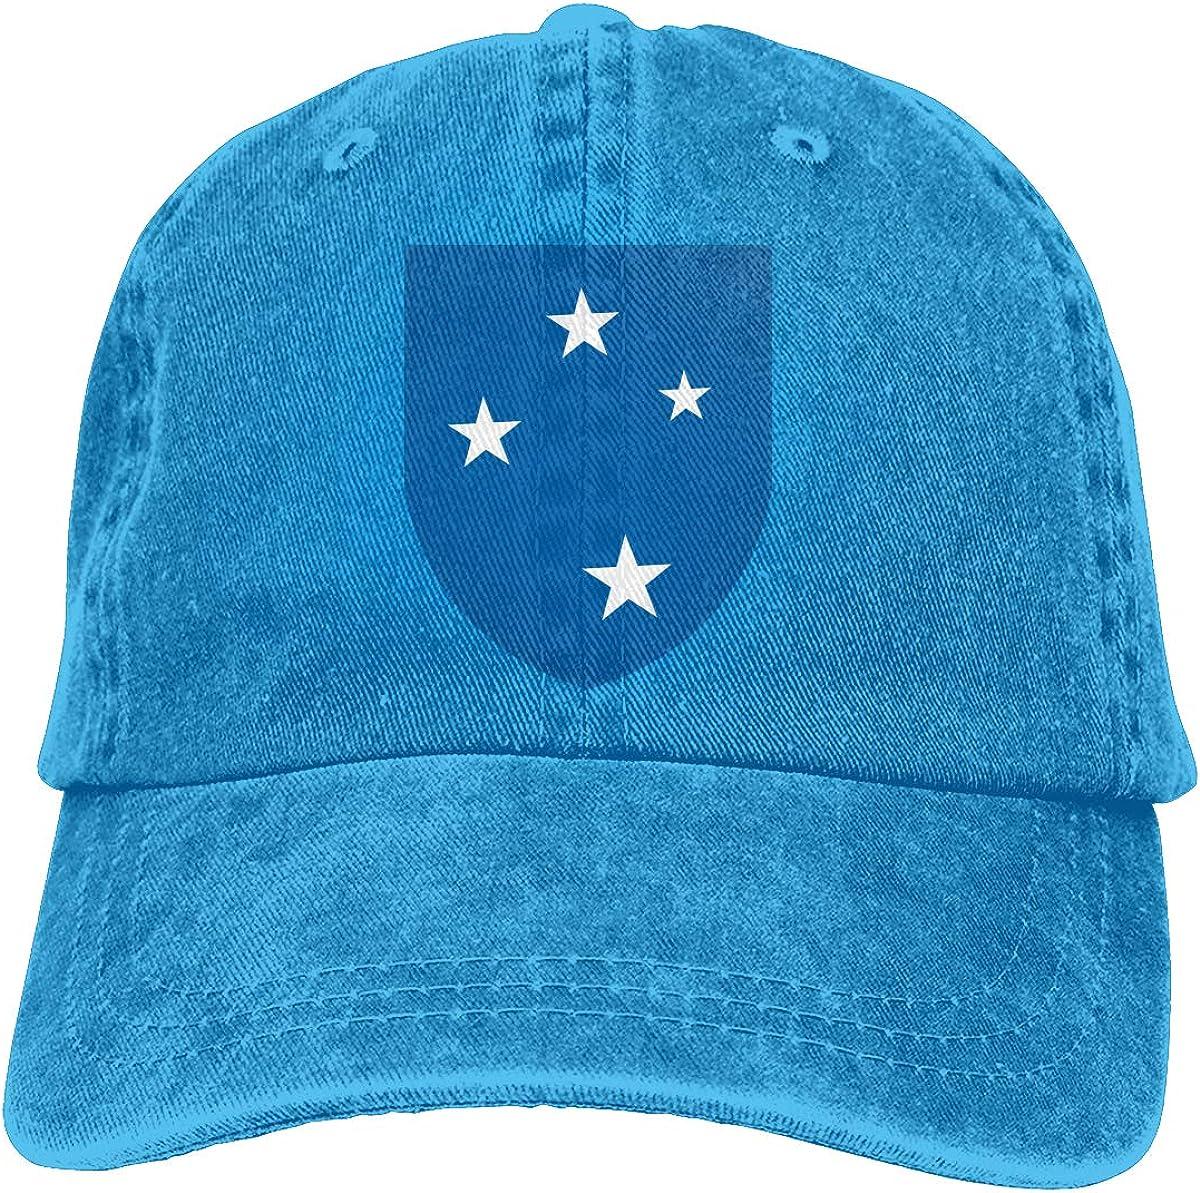 23rd Infantry Division Unisex Baseball Cap Cowboy Hat Dad Hats Trucker Hat